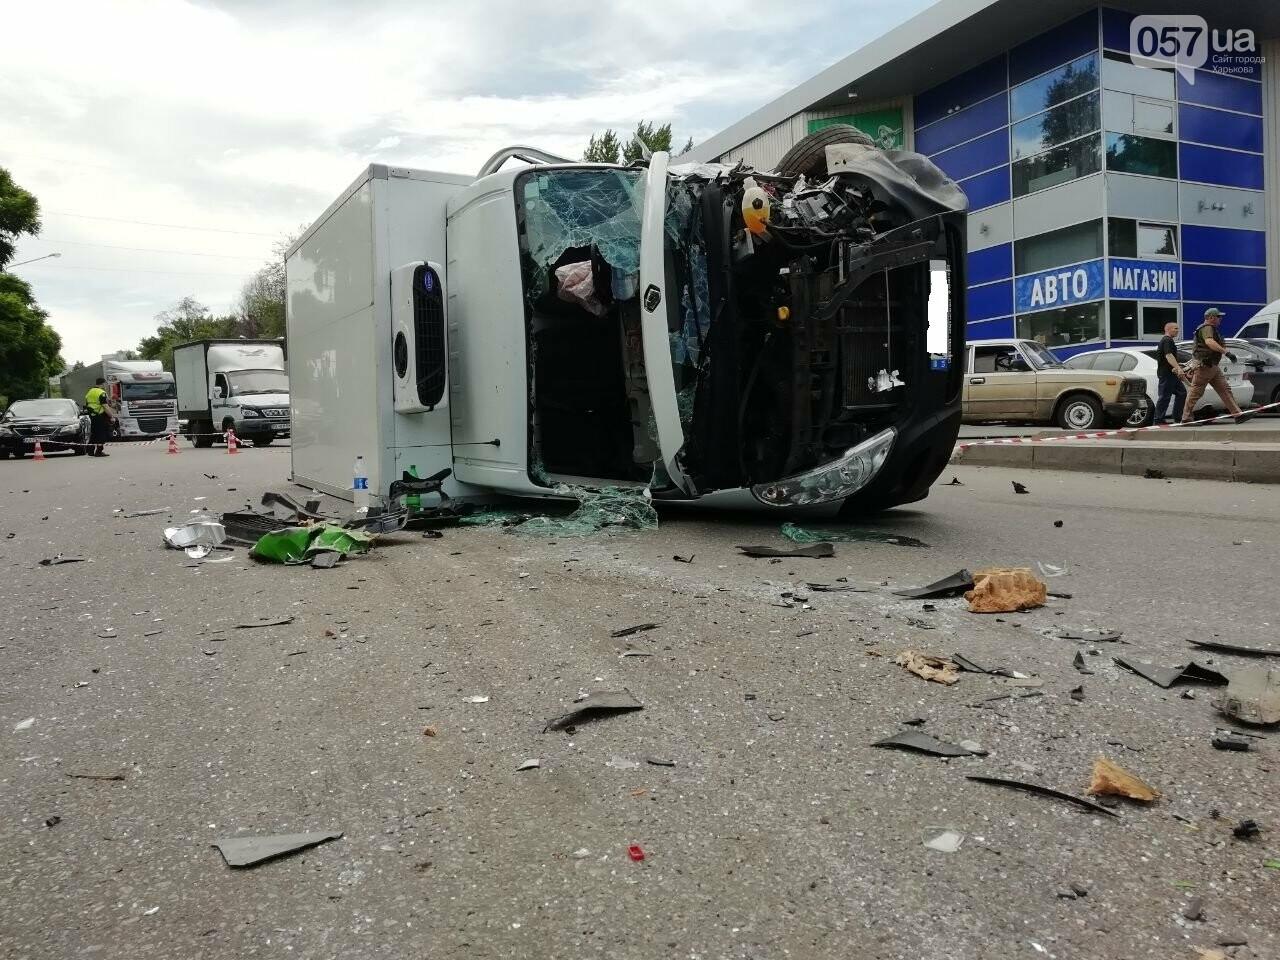 «Все сидели в крови»: подробности аварии на проспекте Тракторостроителей, - ФОТО, ВИДЕО, фото-1